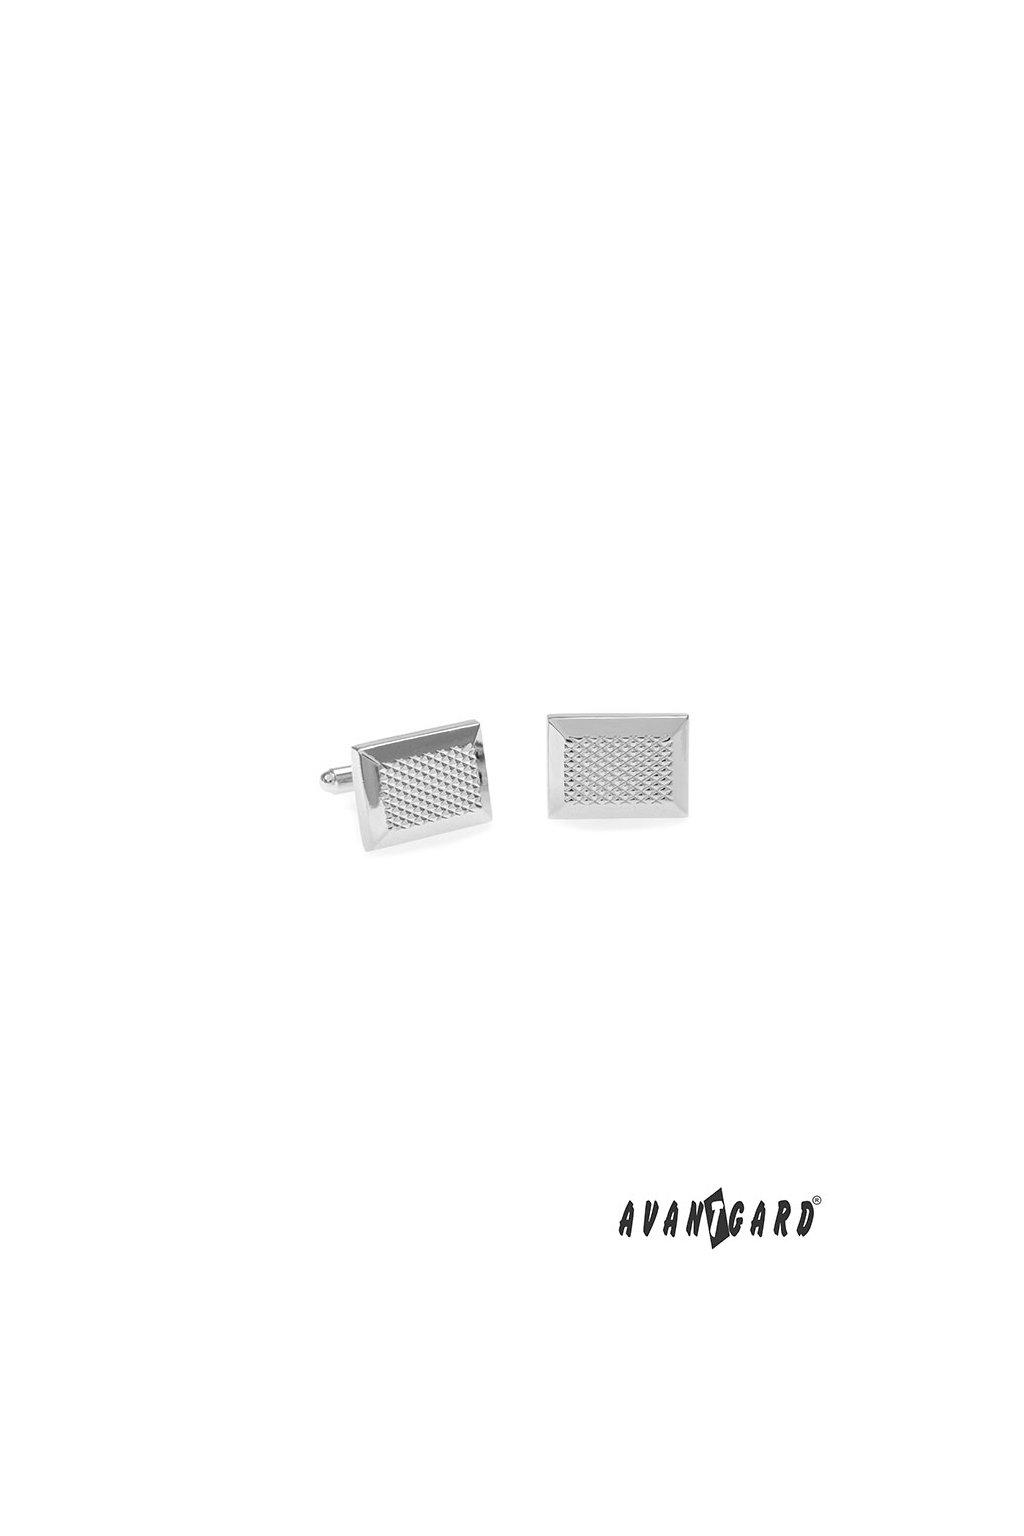 Manžetové knoflíčky AVANTGARD PREMIUM stříbrná lesk 573 - 20664